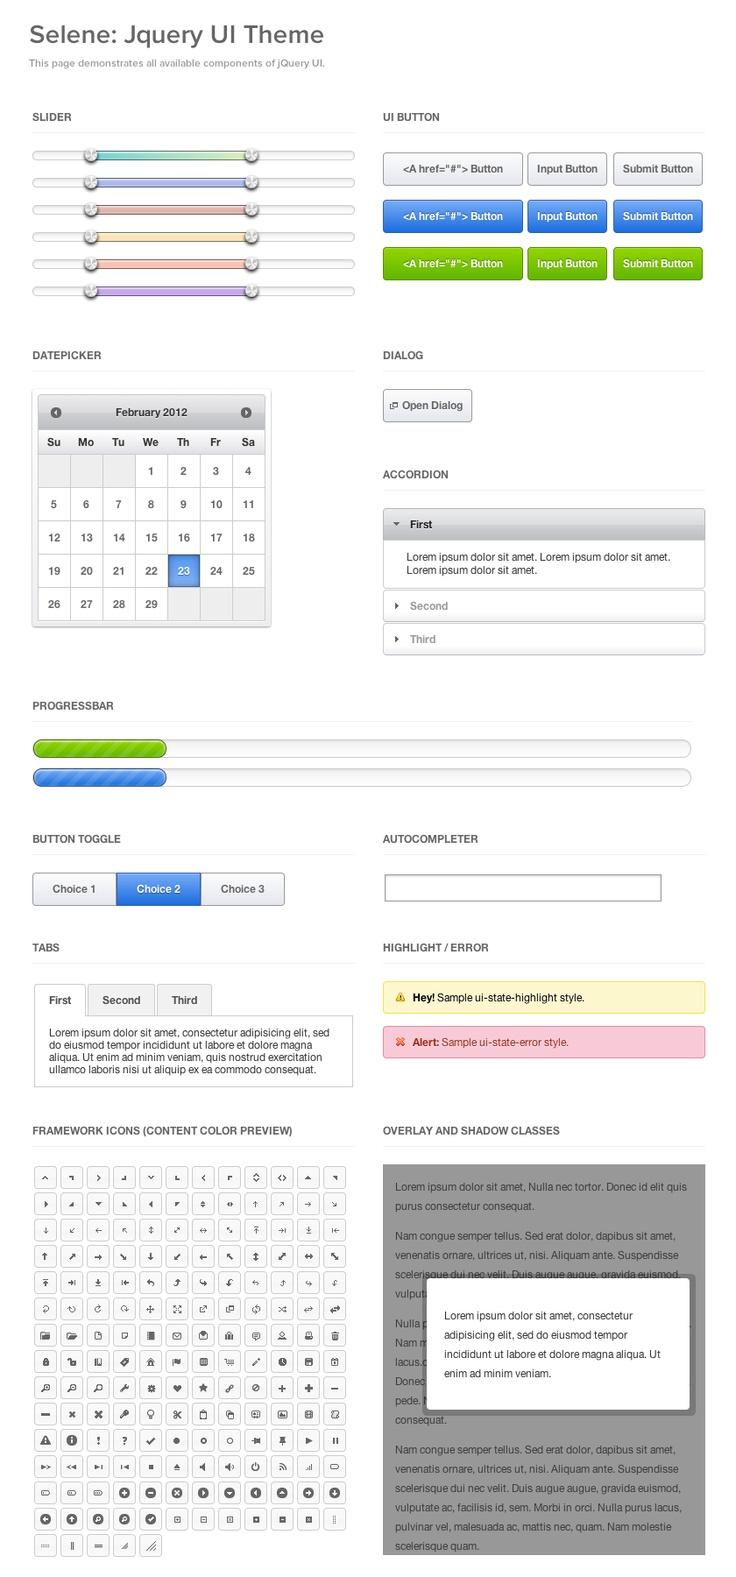 Pickadate js is a lightweight jquery date picker it weighs at 67 pickadate js is a lightweight jquery date picker it weighs at 67kb 27kb gzipped you can also easily theme the calendar using css nvjuhfo Images